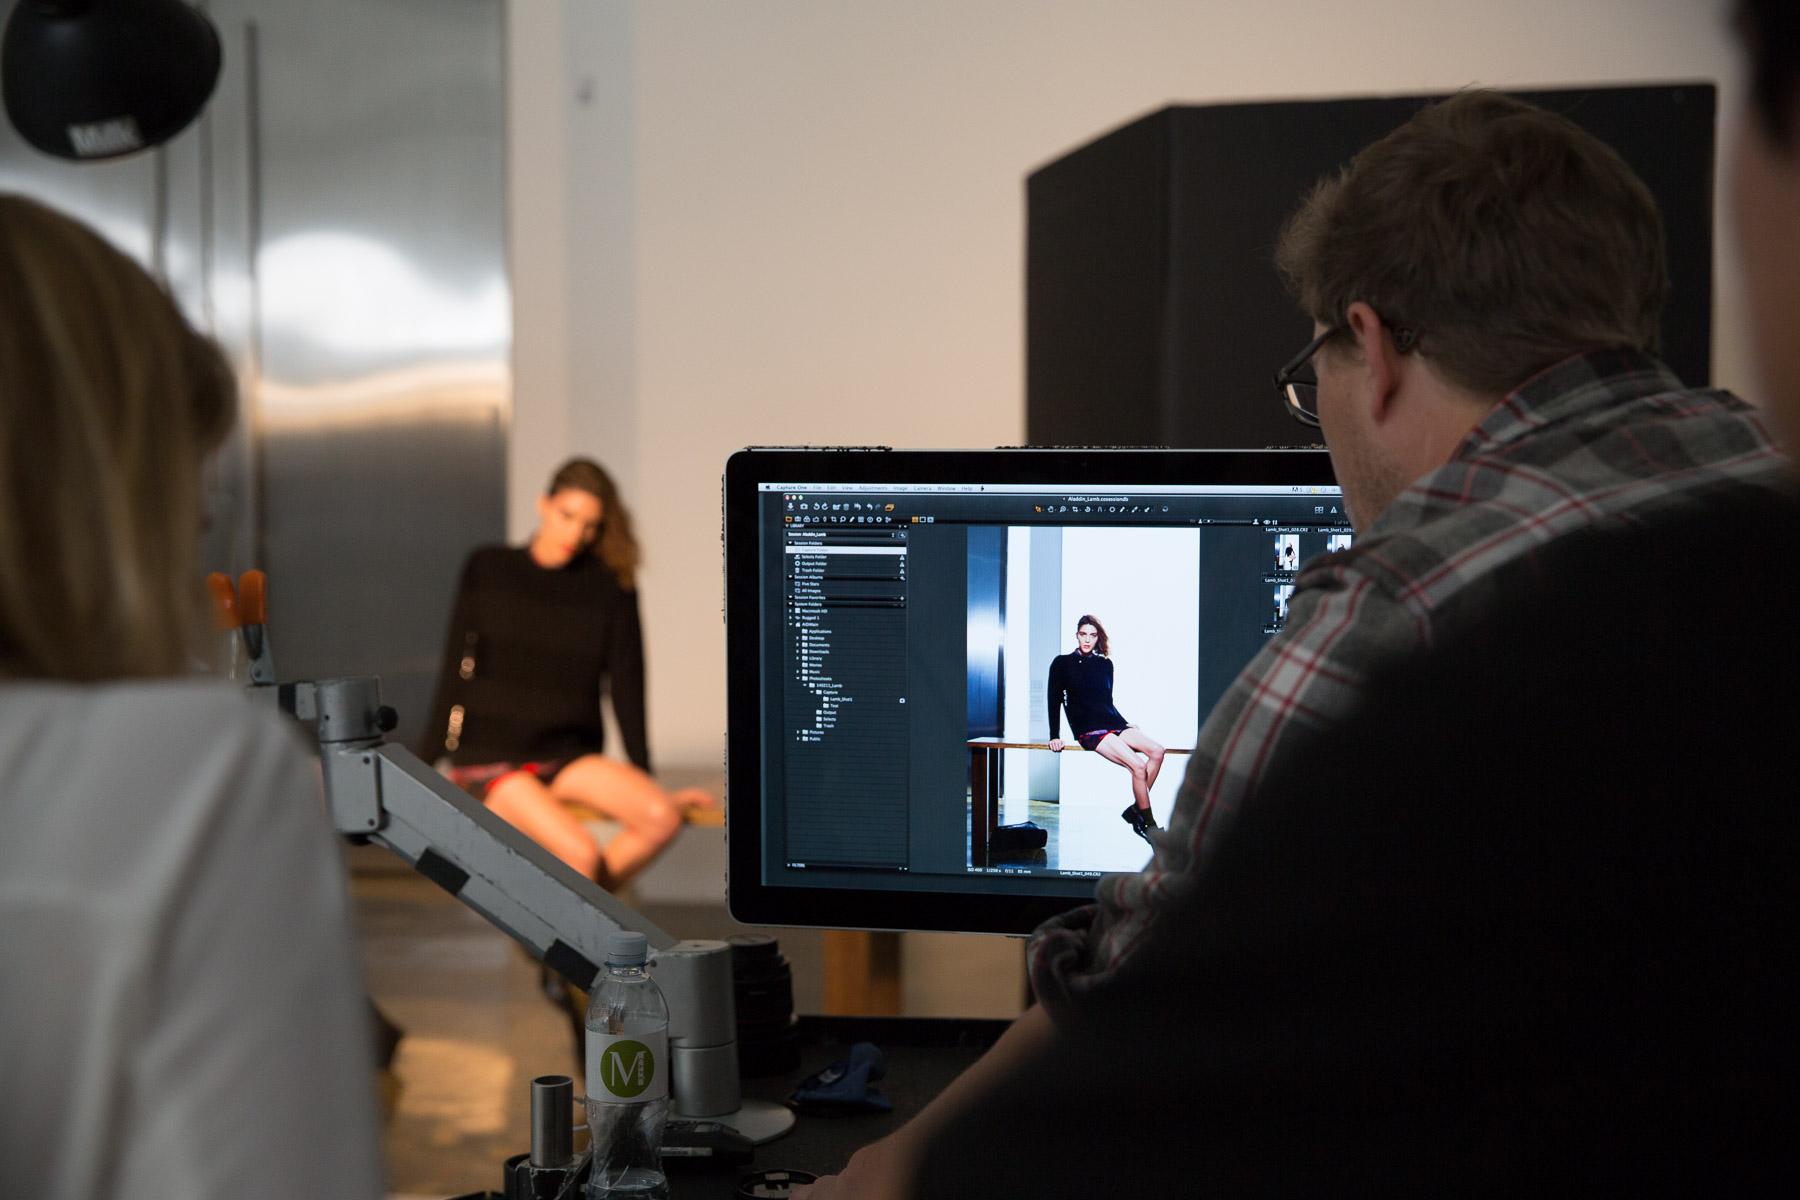 lightroom-to-process-photos.jpg